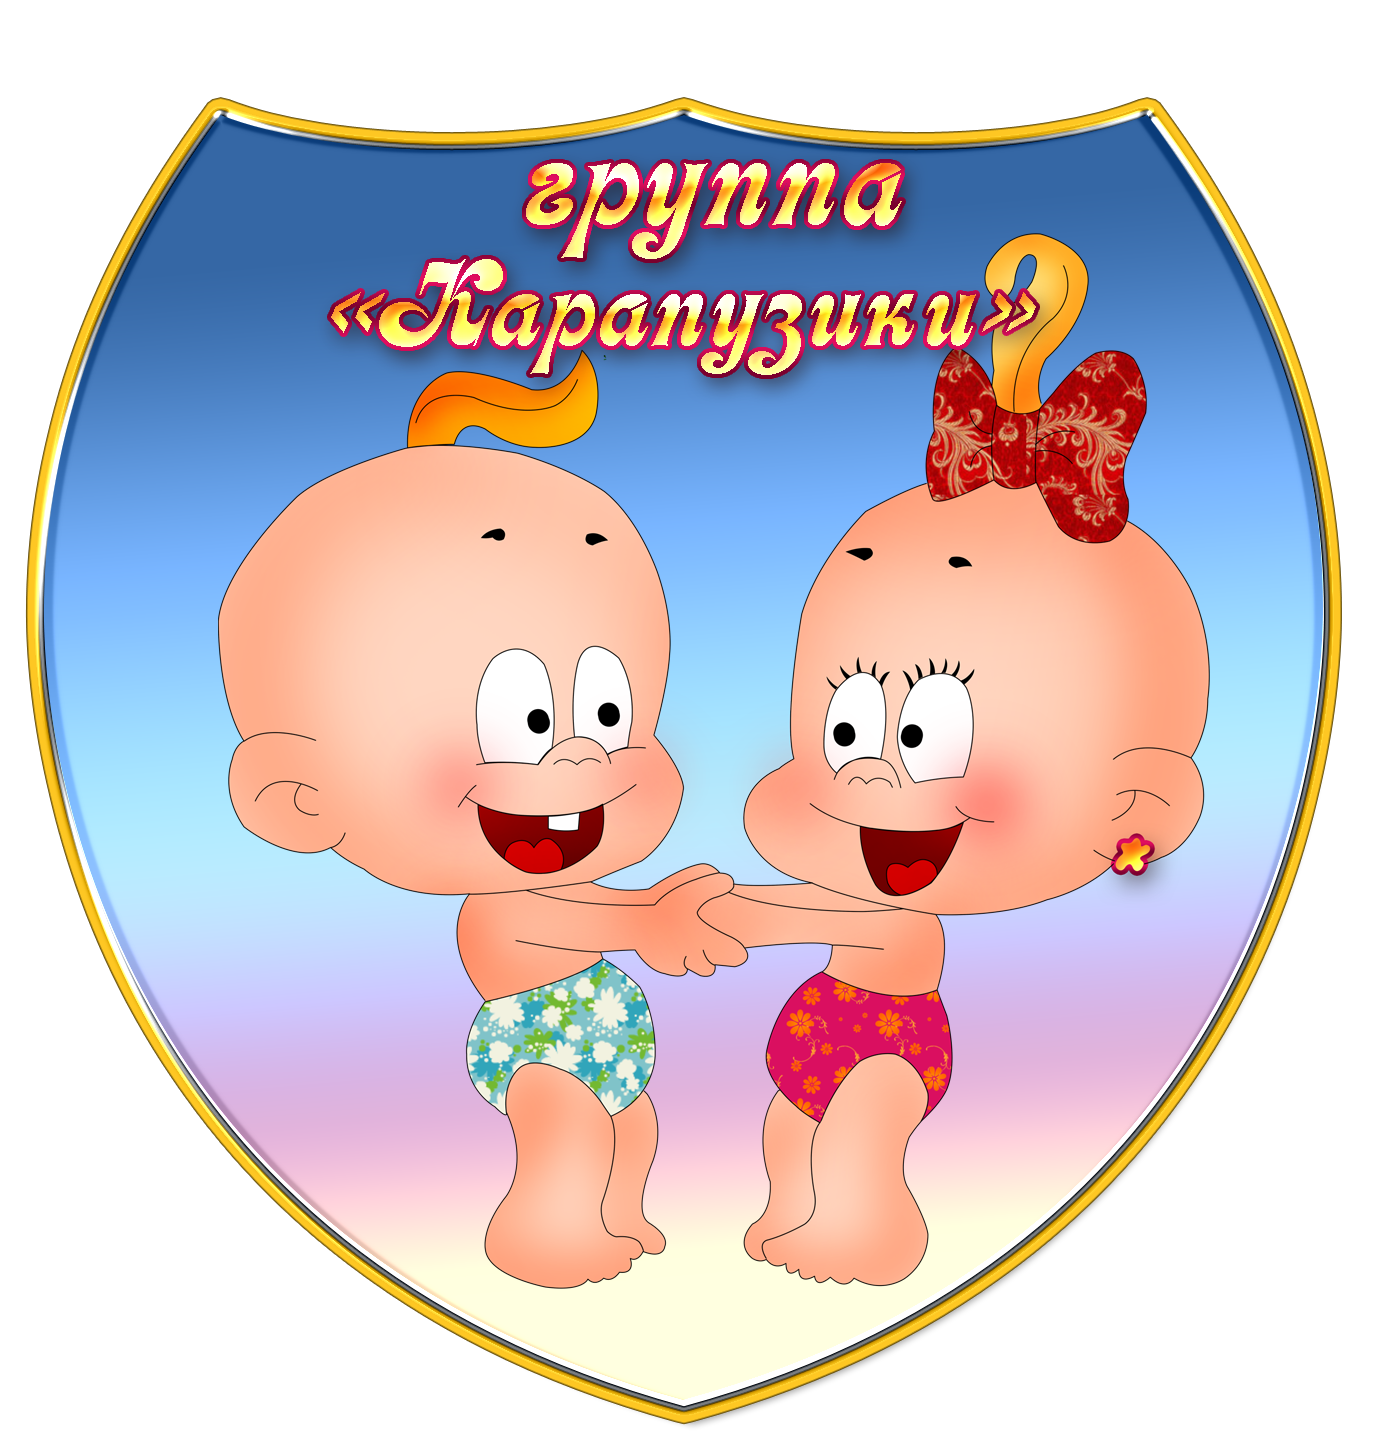 7737142.200000002_gerb_gr_karapuziki.png